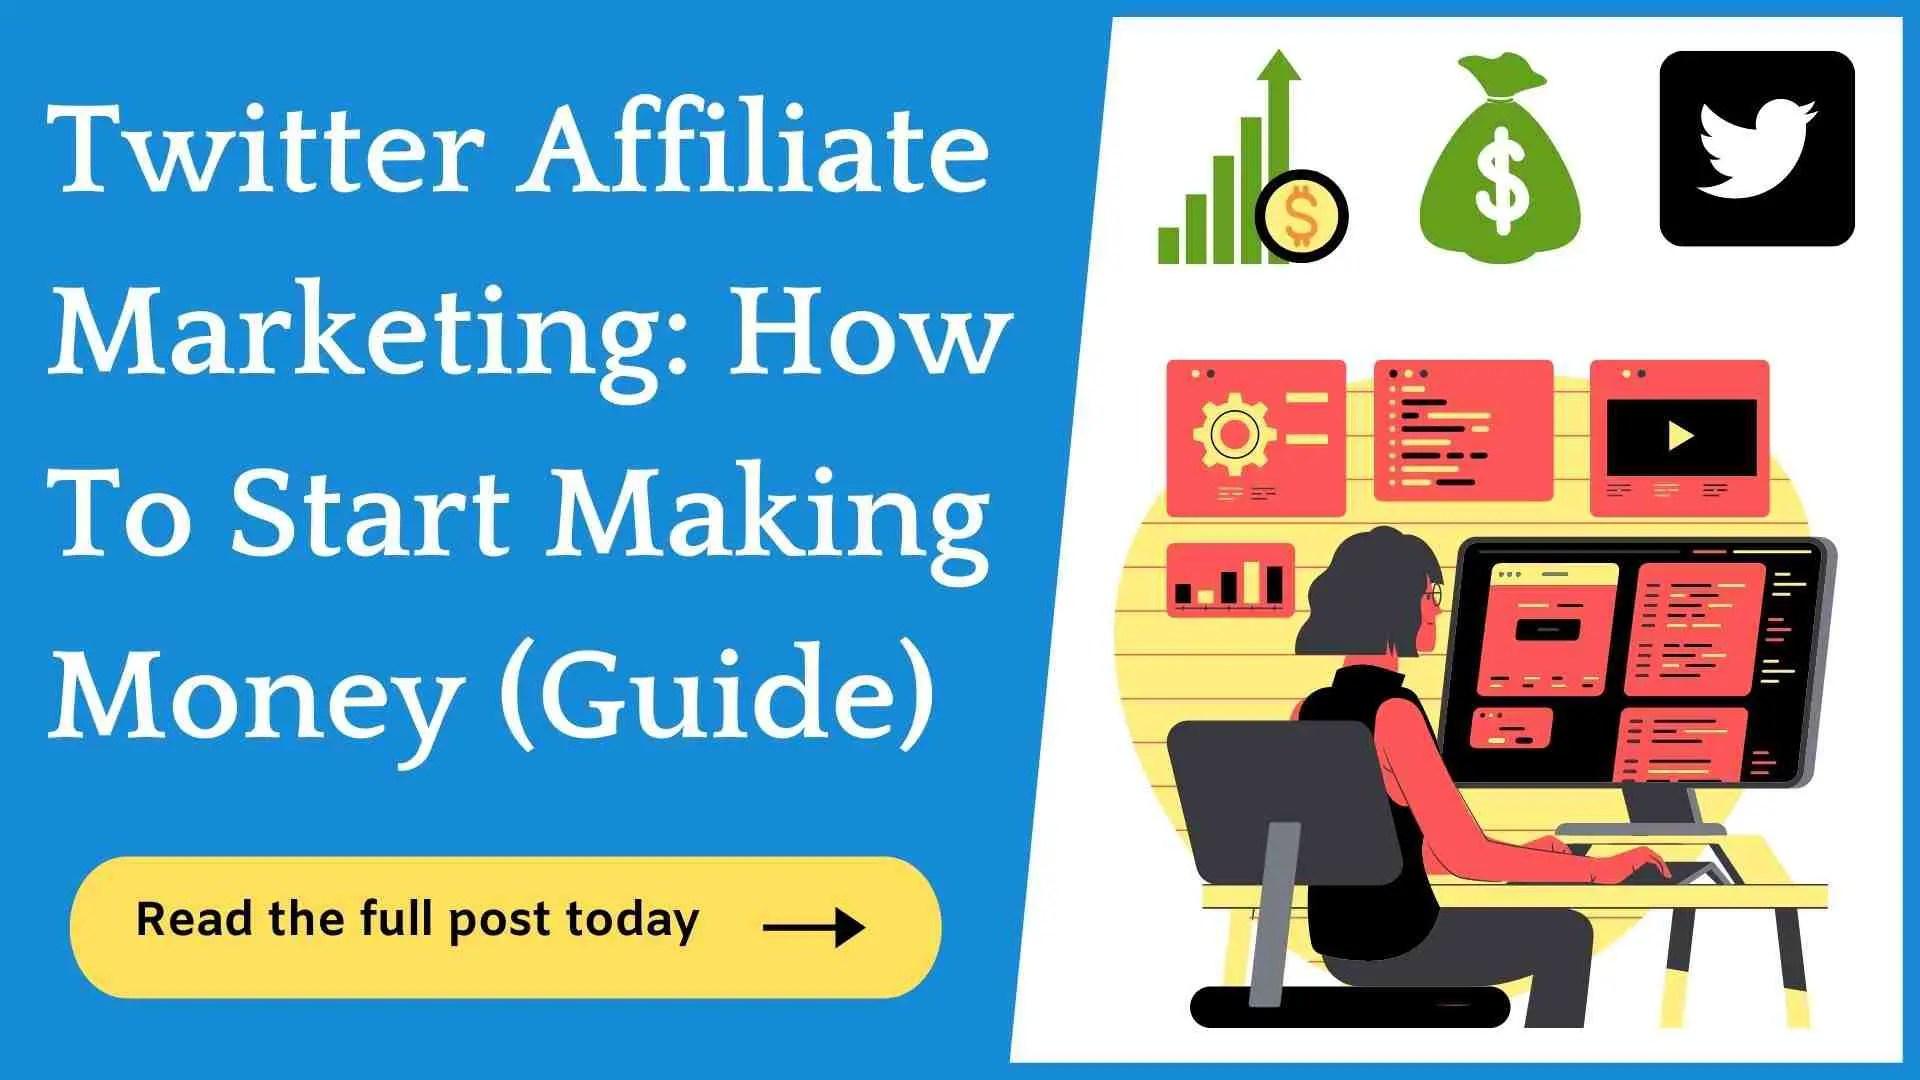 Twitter Affiliate Marketing: How To Start (& Make $$$ Easily)